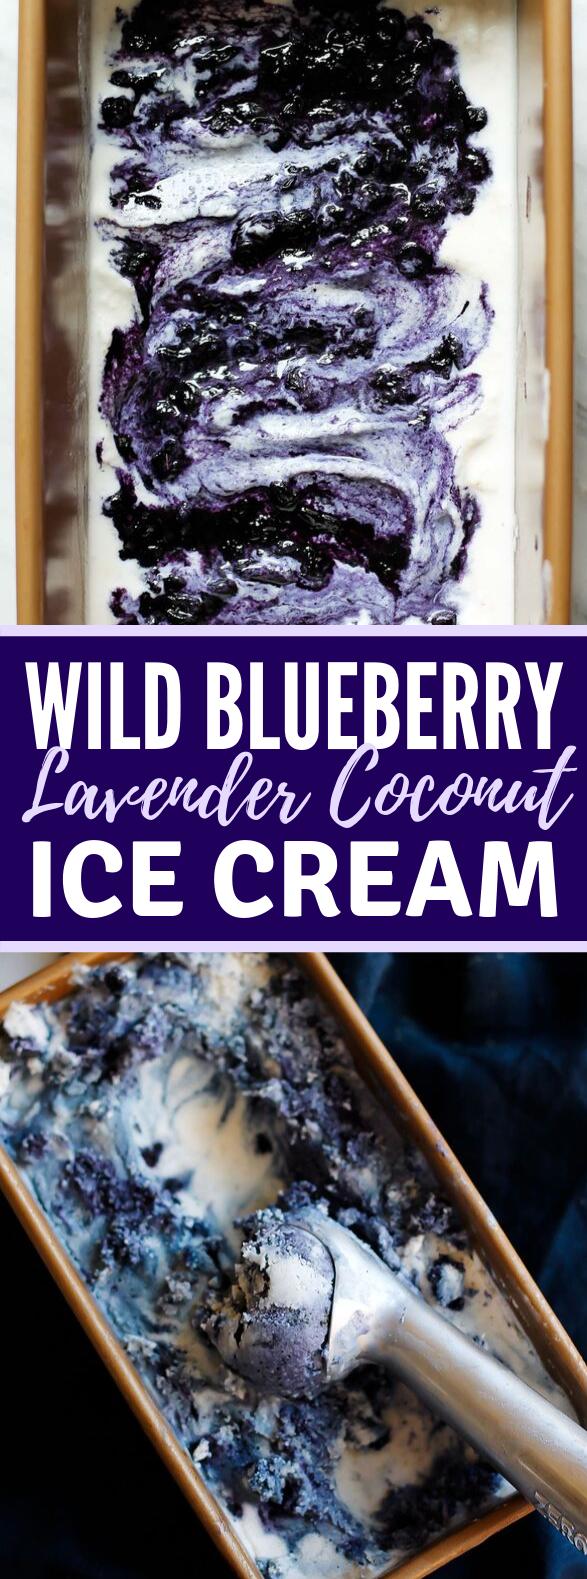 Wild Blueberry Lavender Coconut Ice Cream #desserts #vegan